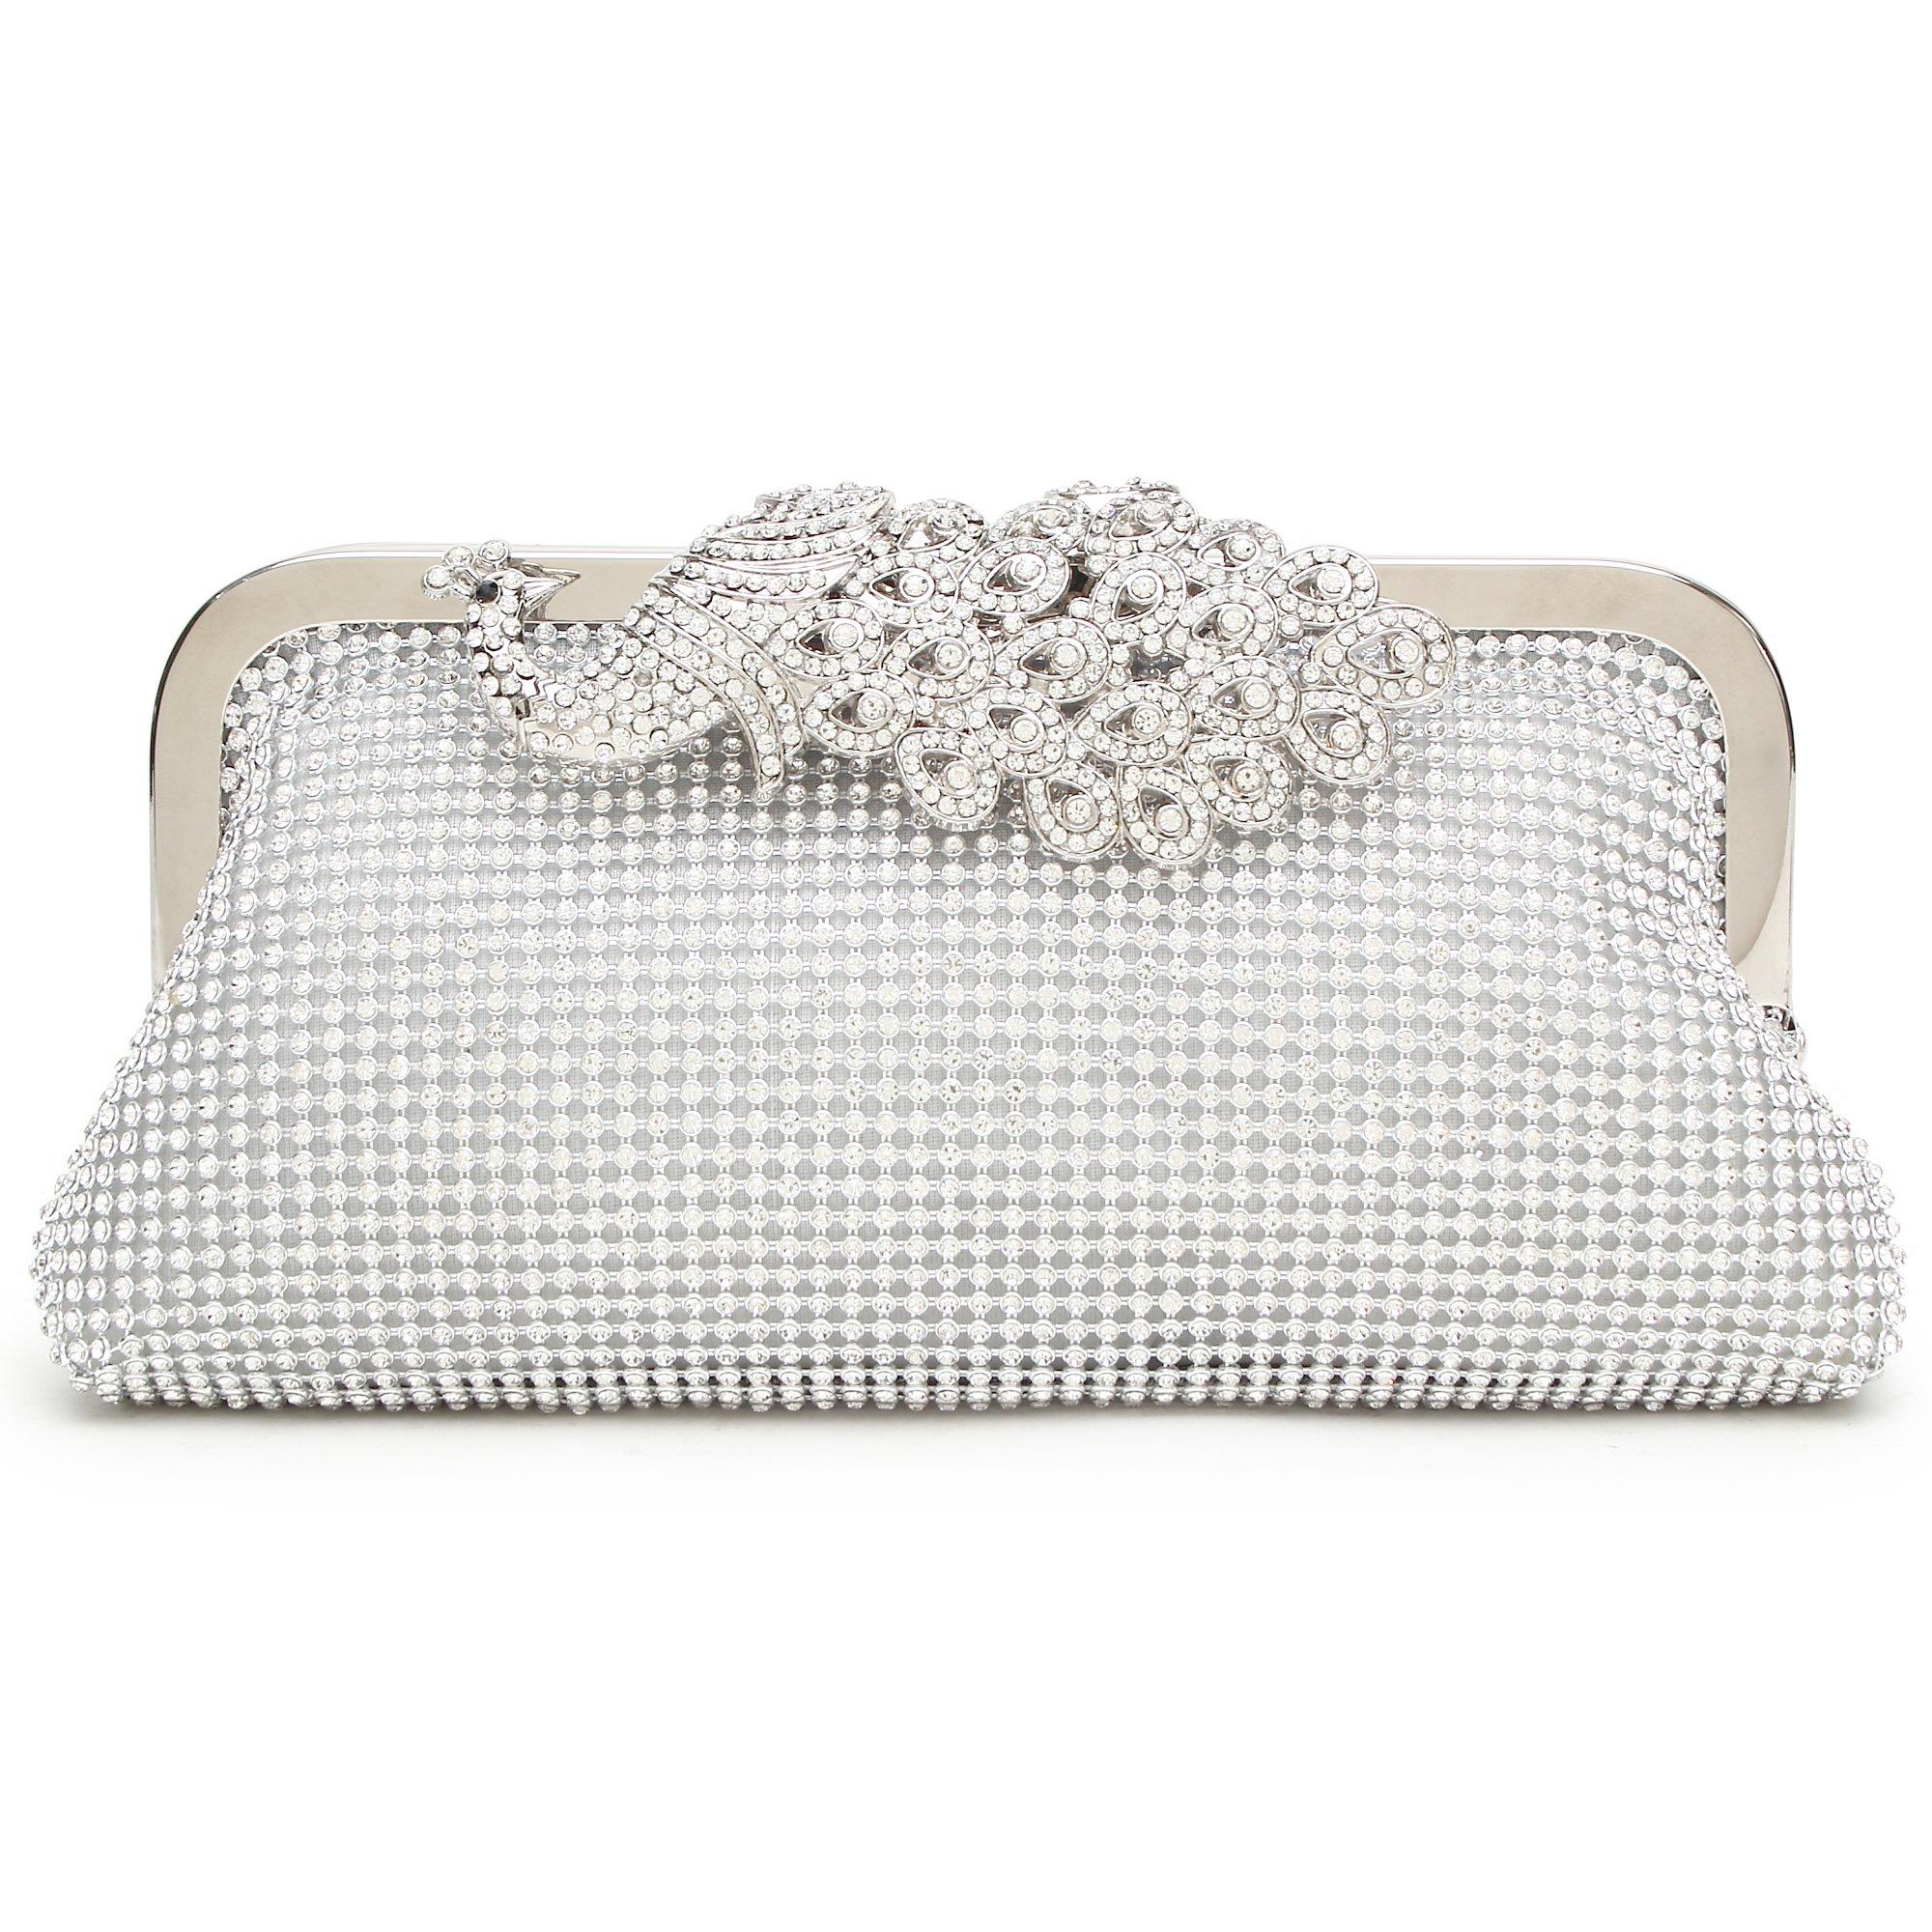 Minicastle Womens Evening Clutch Bag Wedding Purse Bridal Prom Handbag Cocktail Party Bag